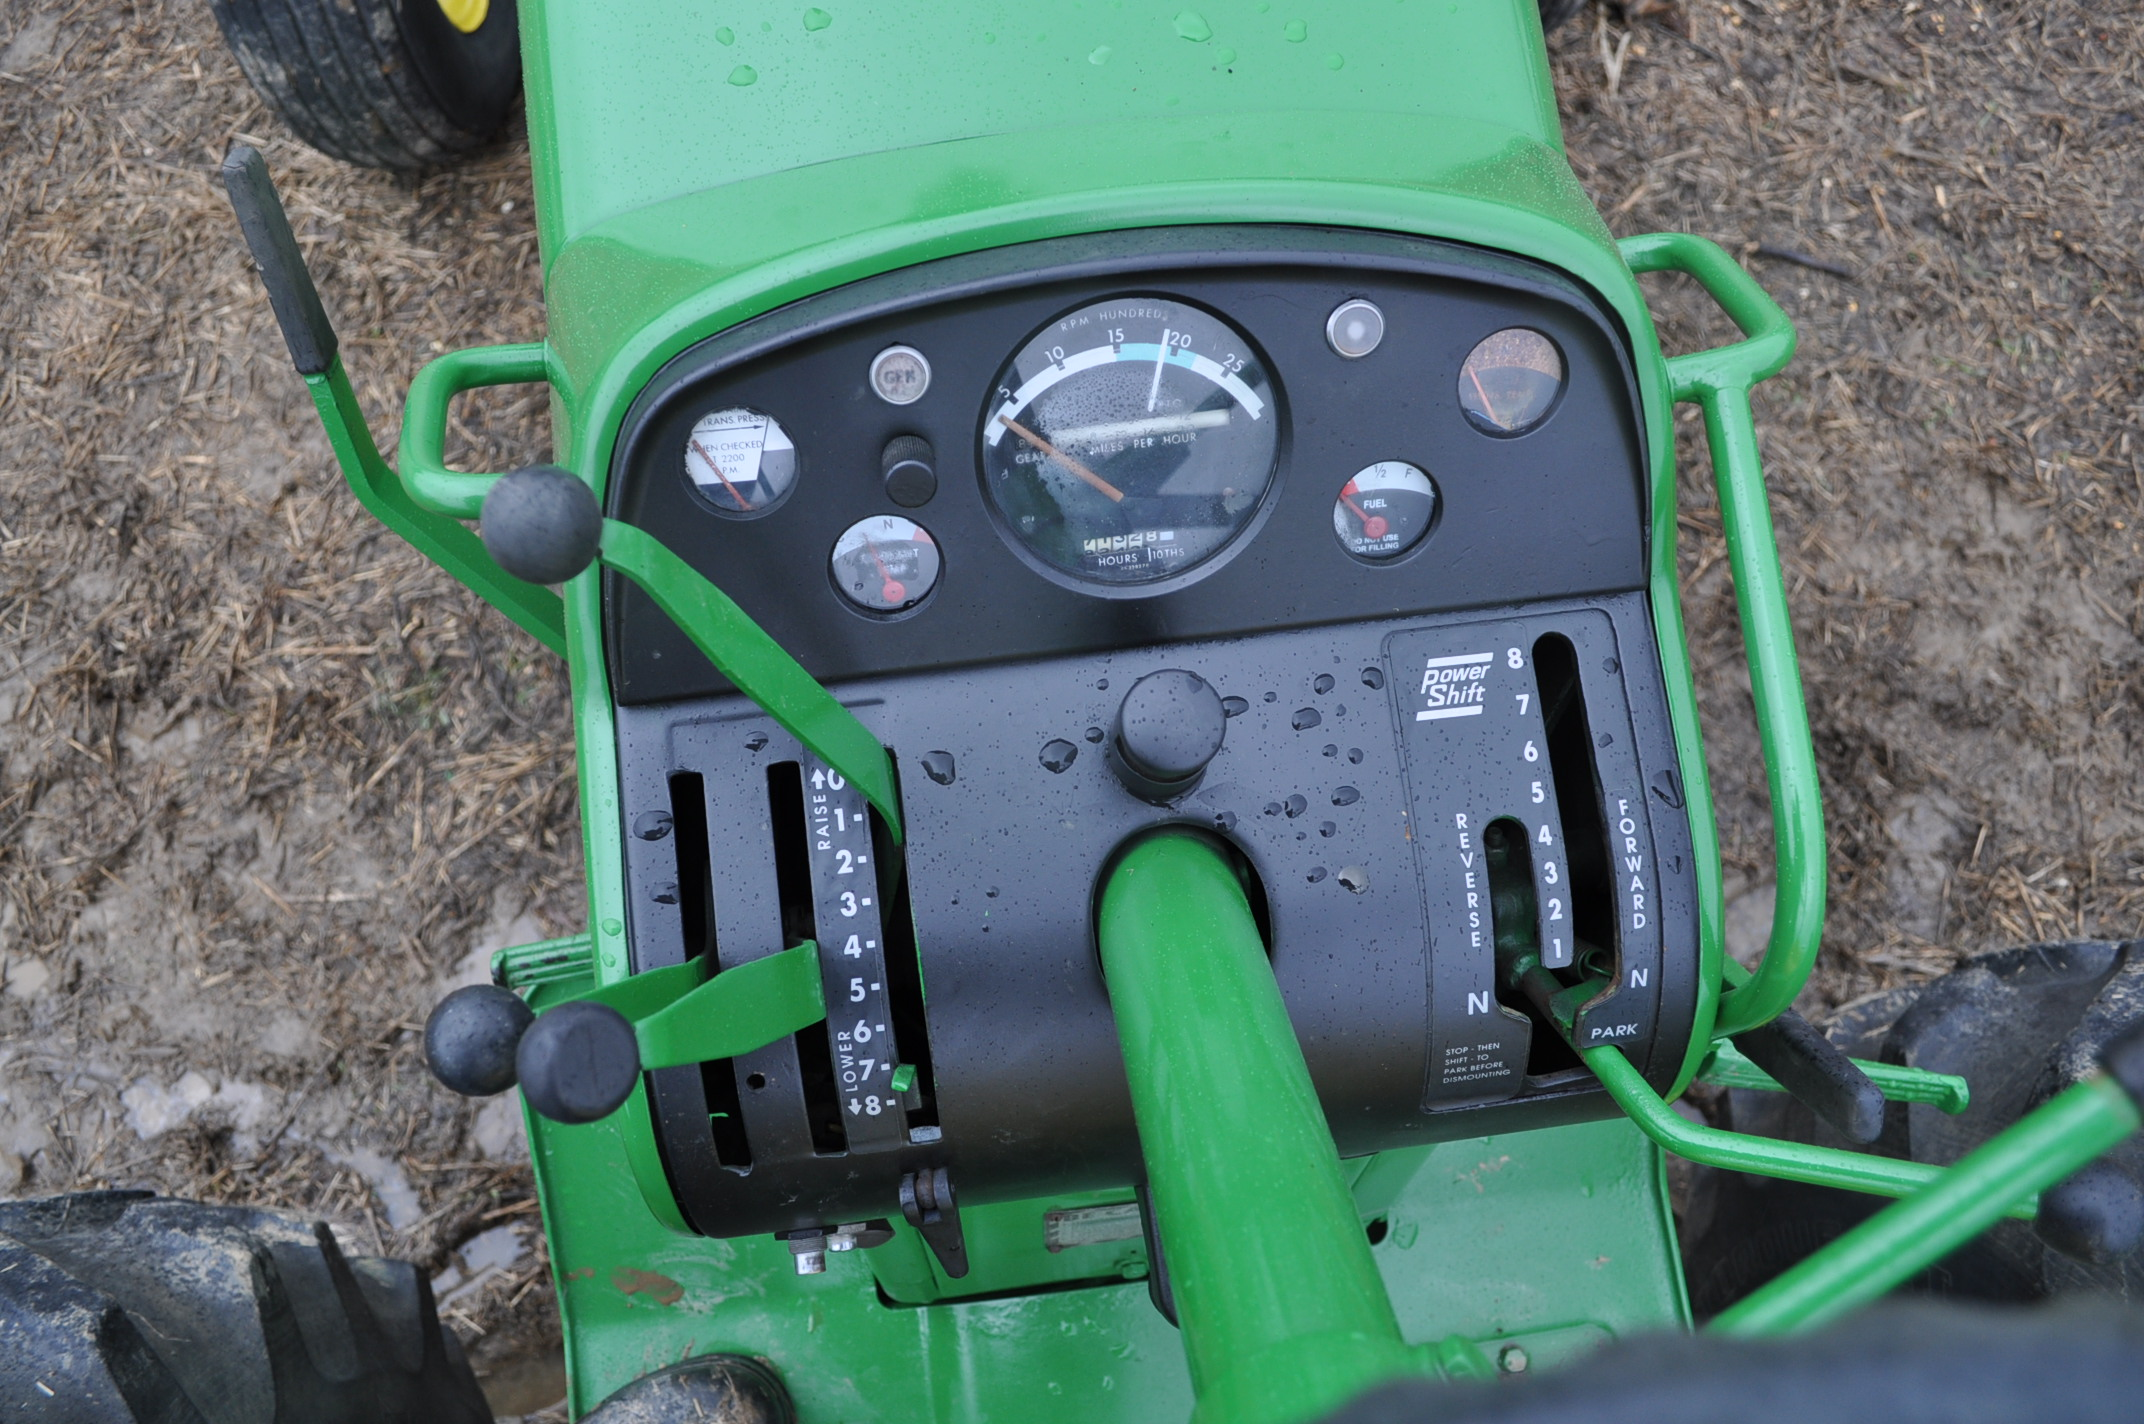 John Deere 4020 powershift, major overhaul on motor, 12V system, dual hyd remotes, wide front, 7,130 - Image 17 of 18